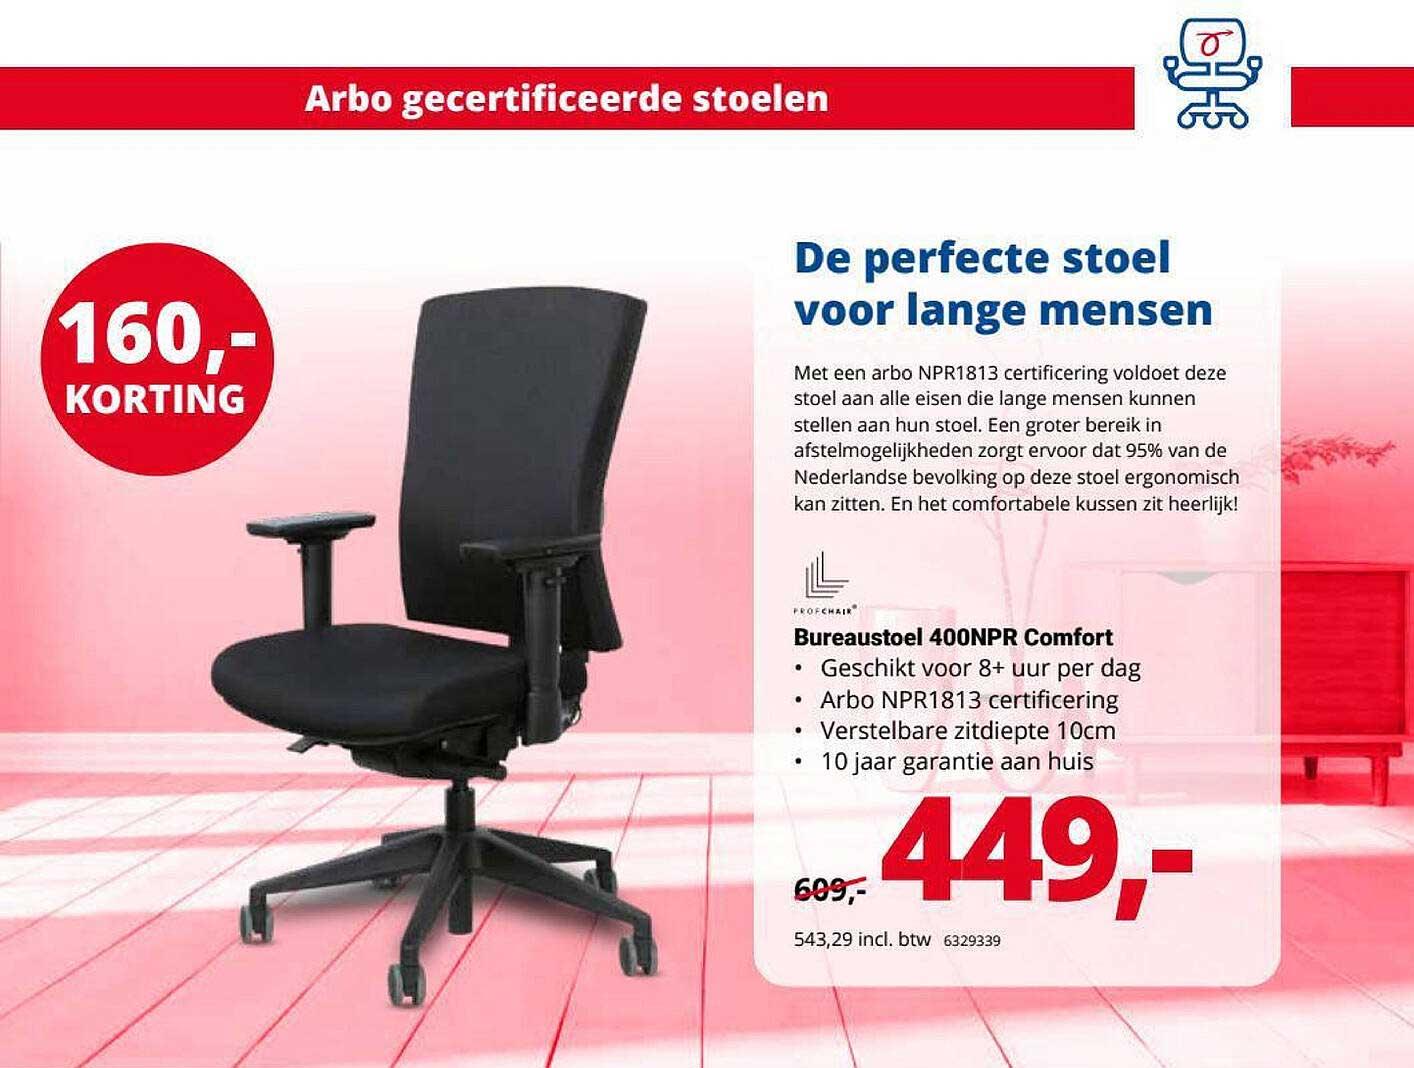 Office Centre Bureaustoel 400NPR Comfort 160,- Korting